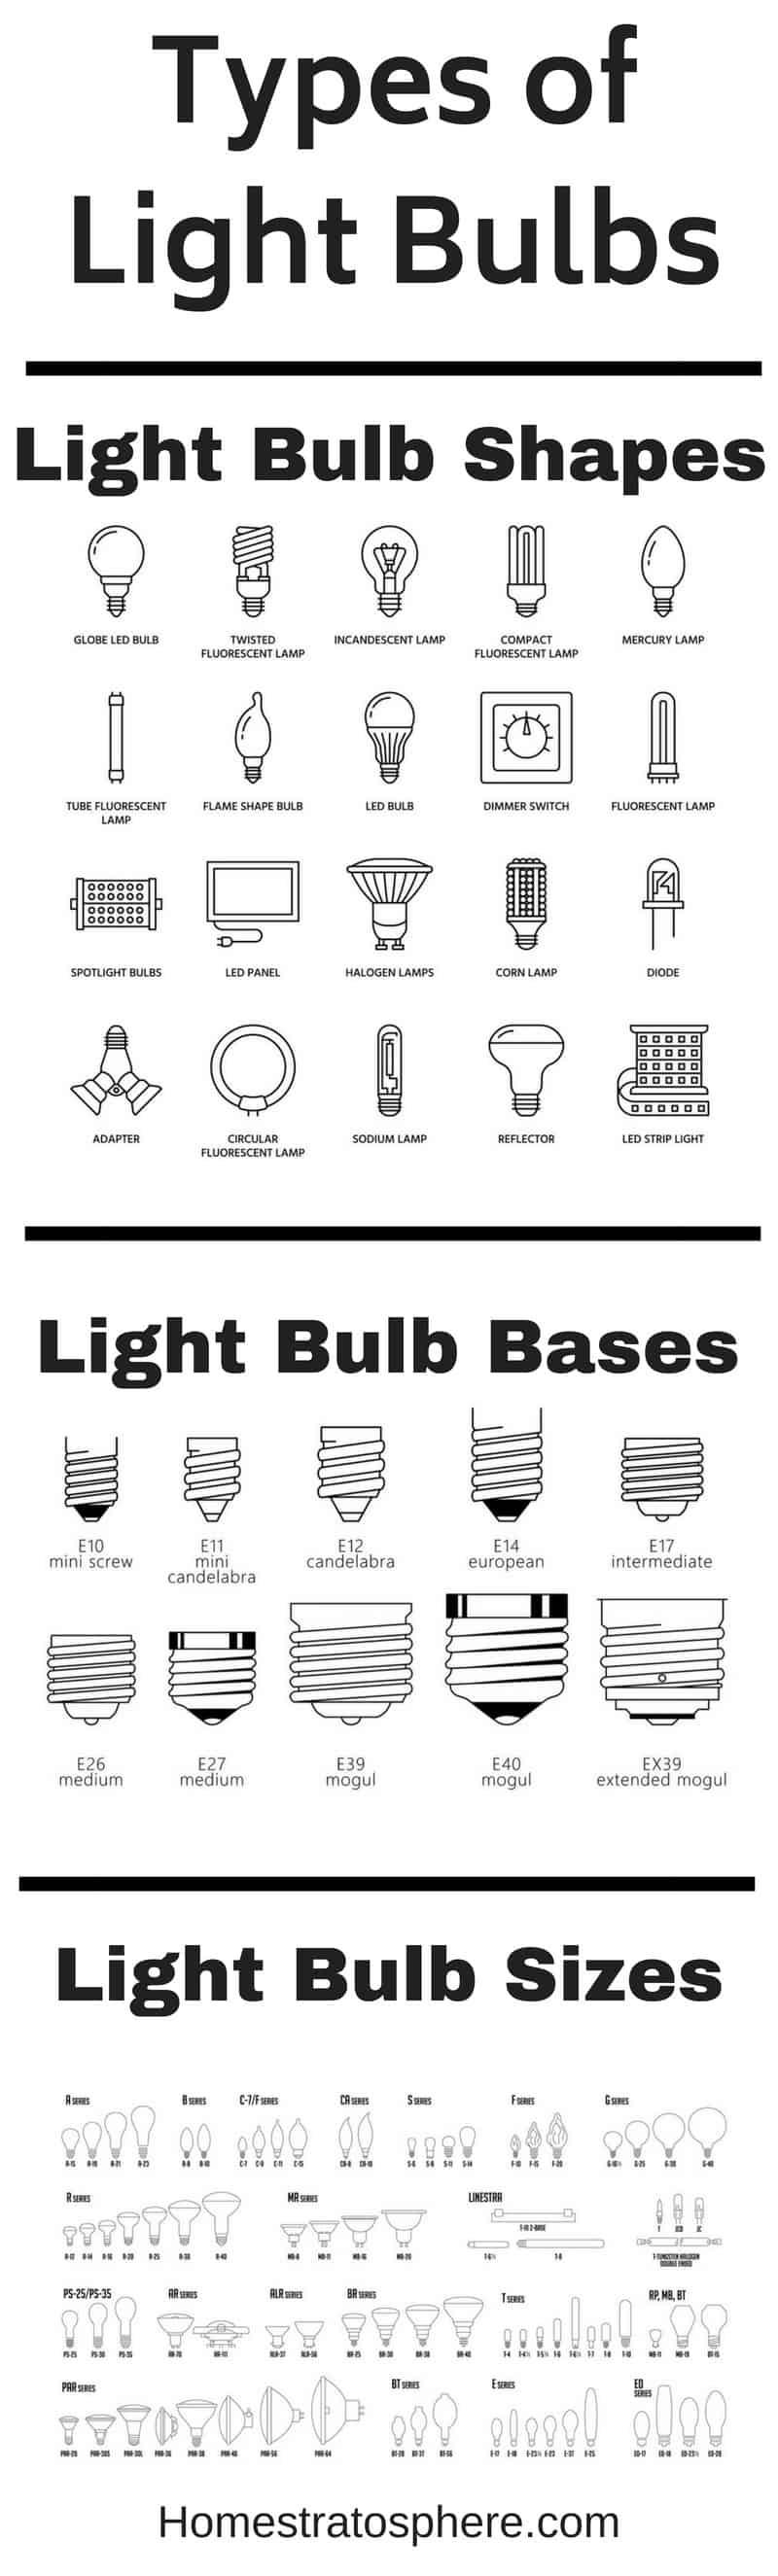 Types of Light Bulbs Chart